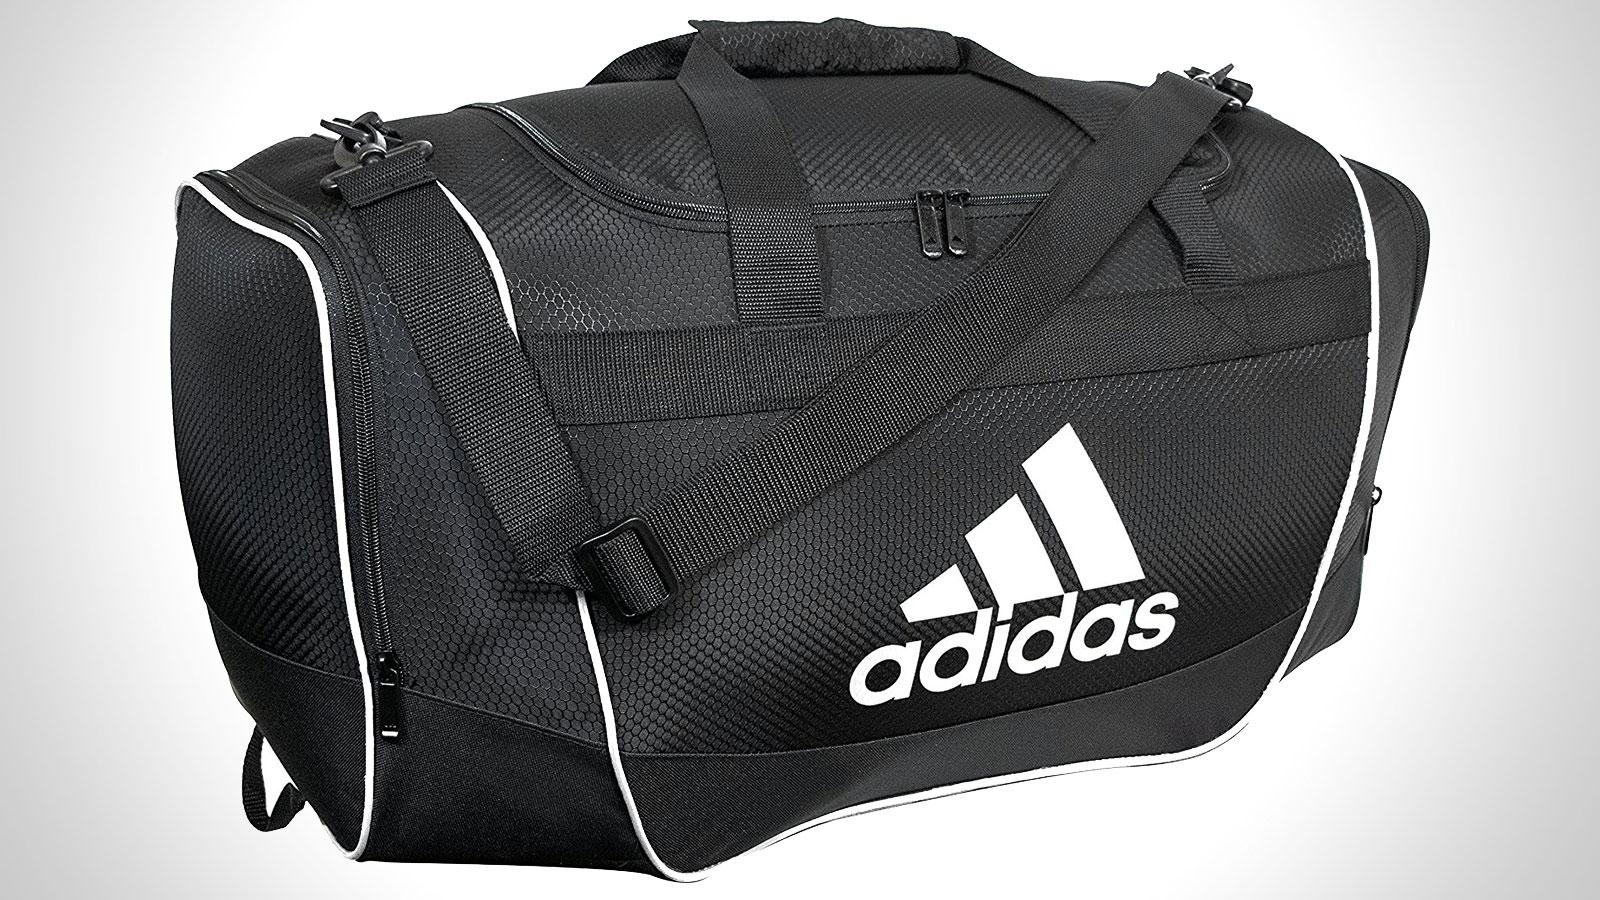 Adidas Defender 2 Duffel | best mens gym duffle bag